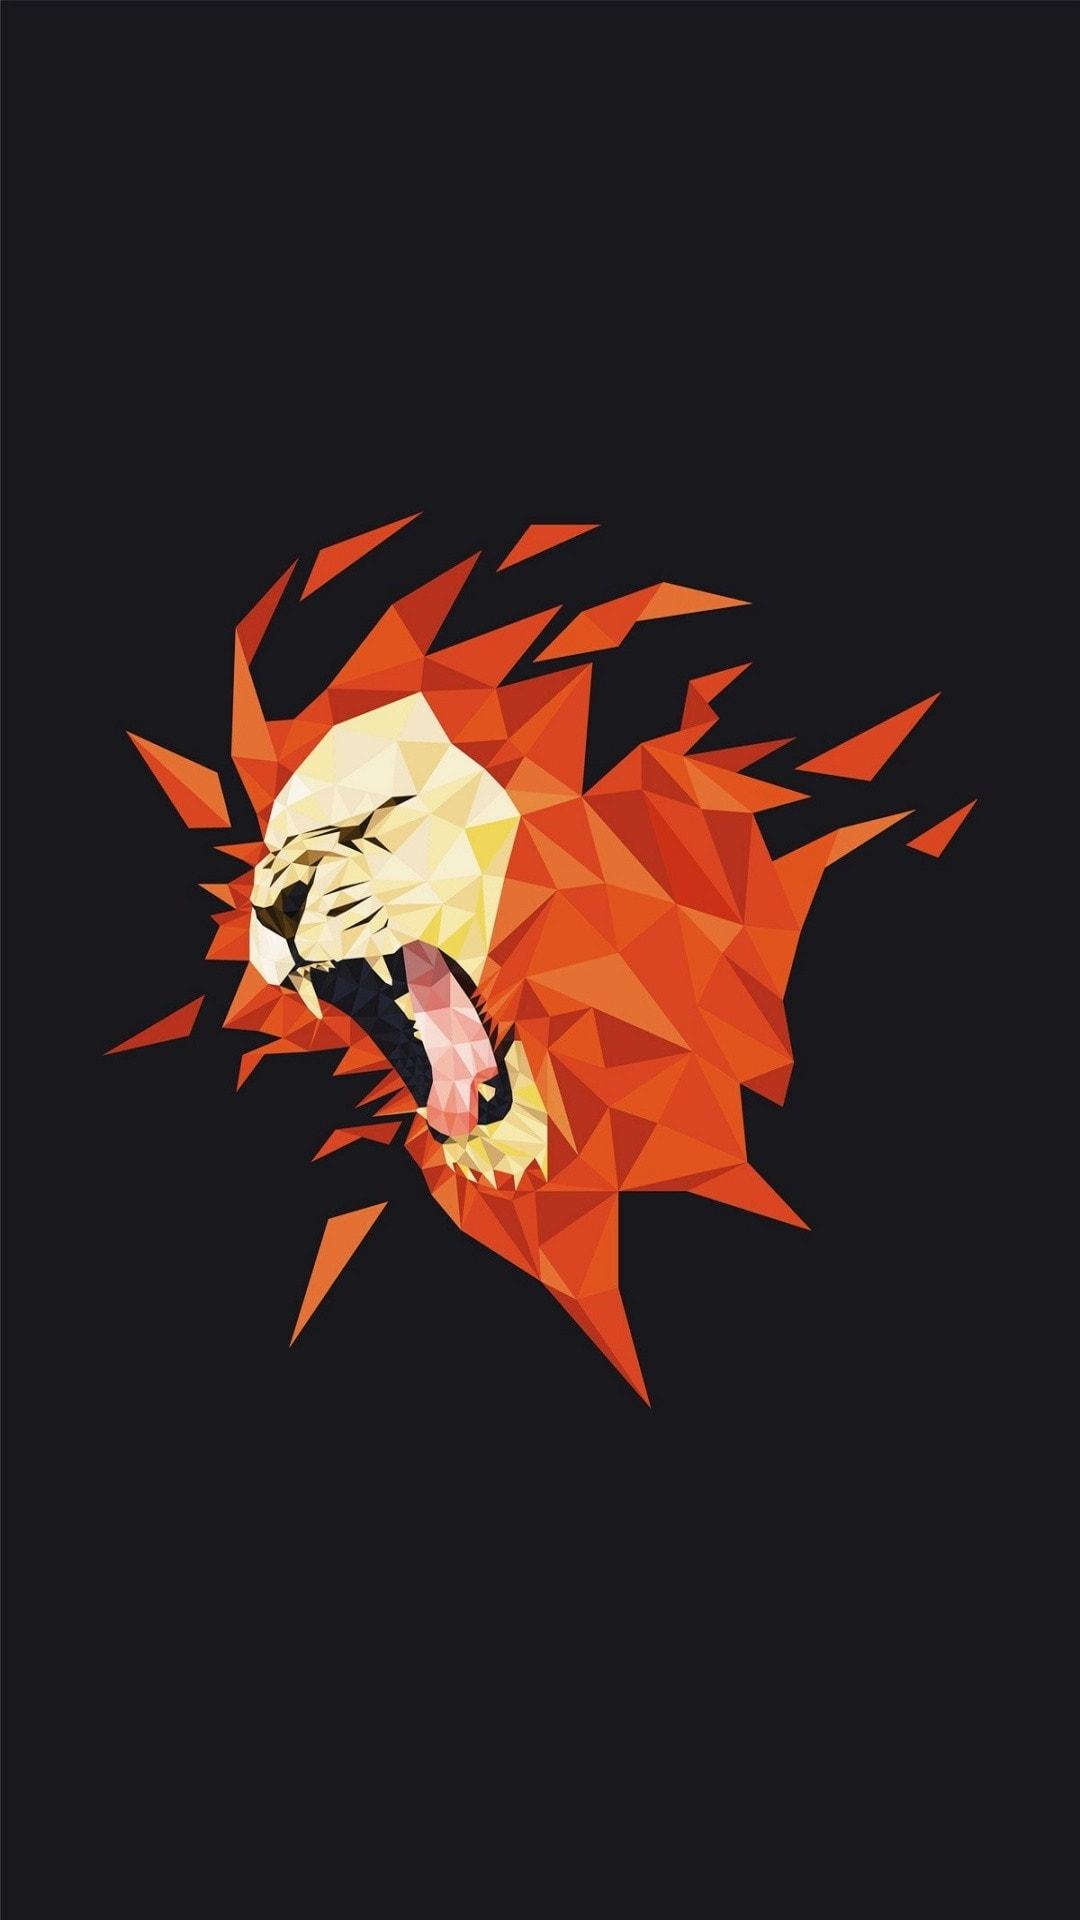 Poligon Lion Art Minimal iPhone Wallpaper